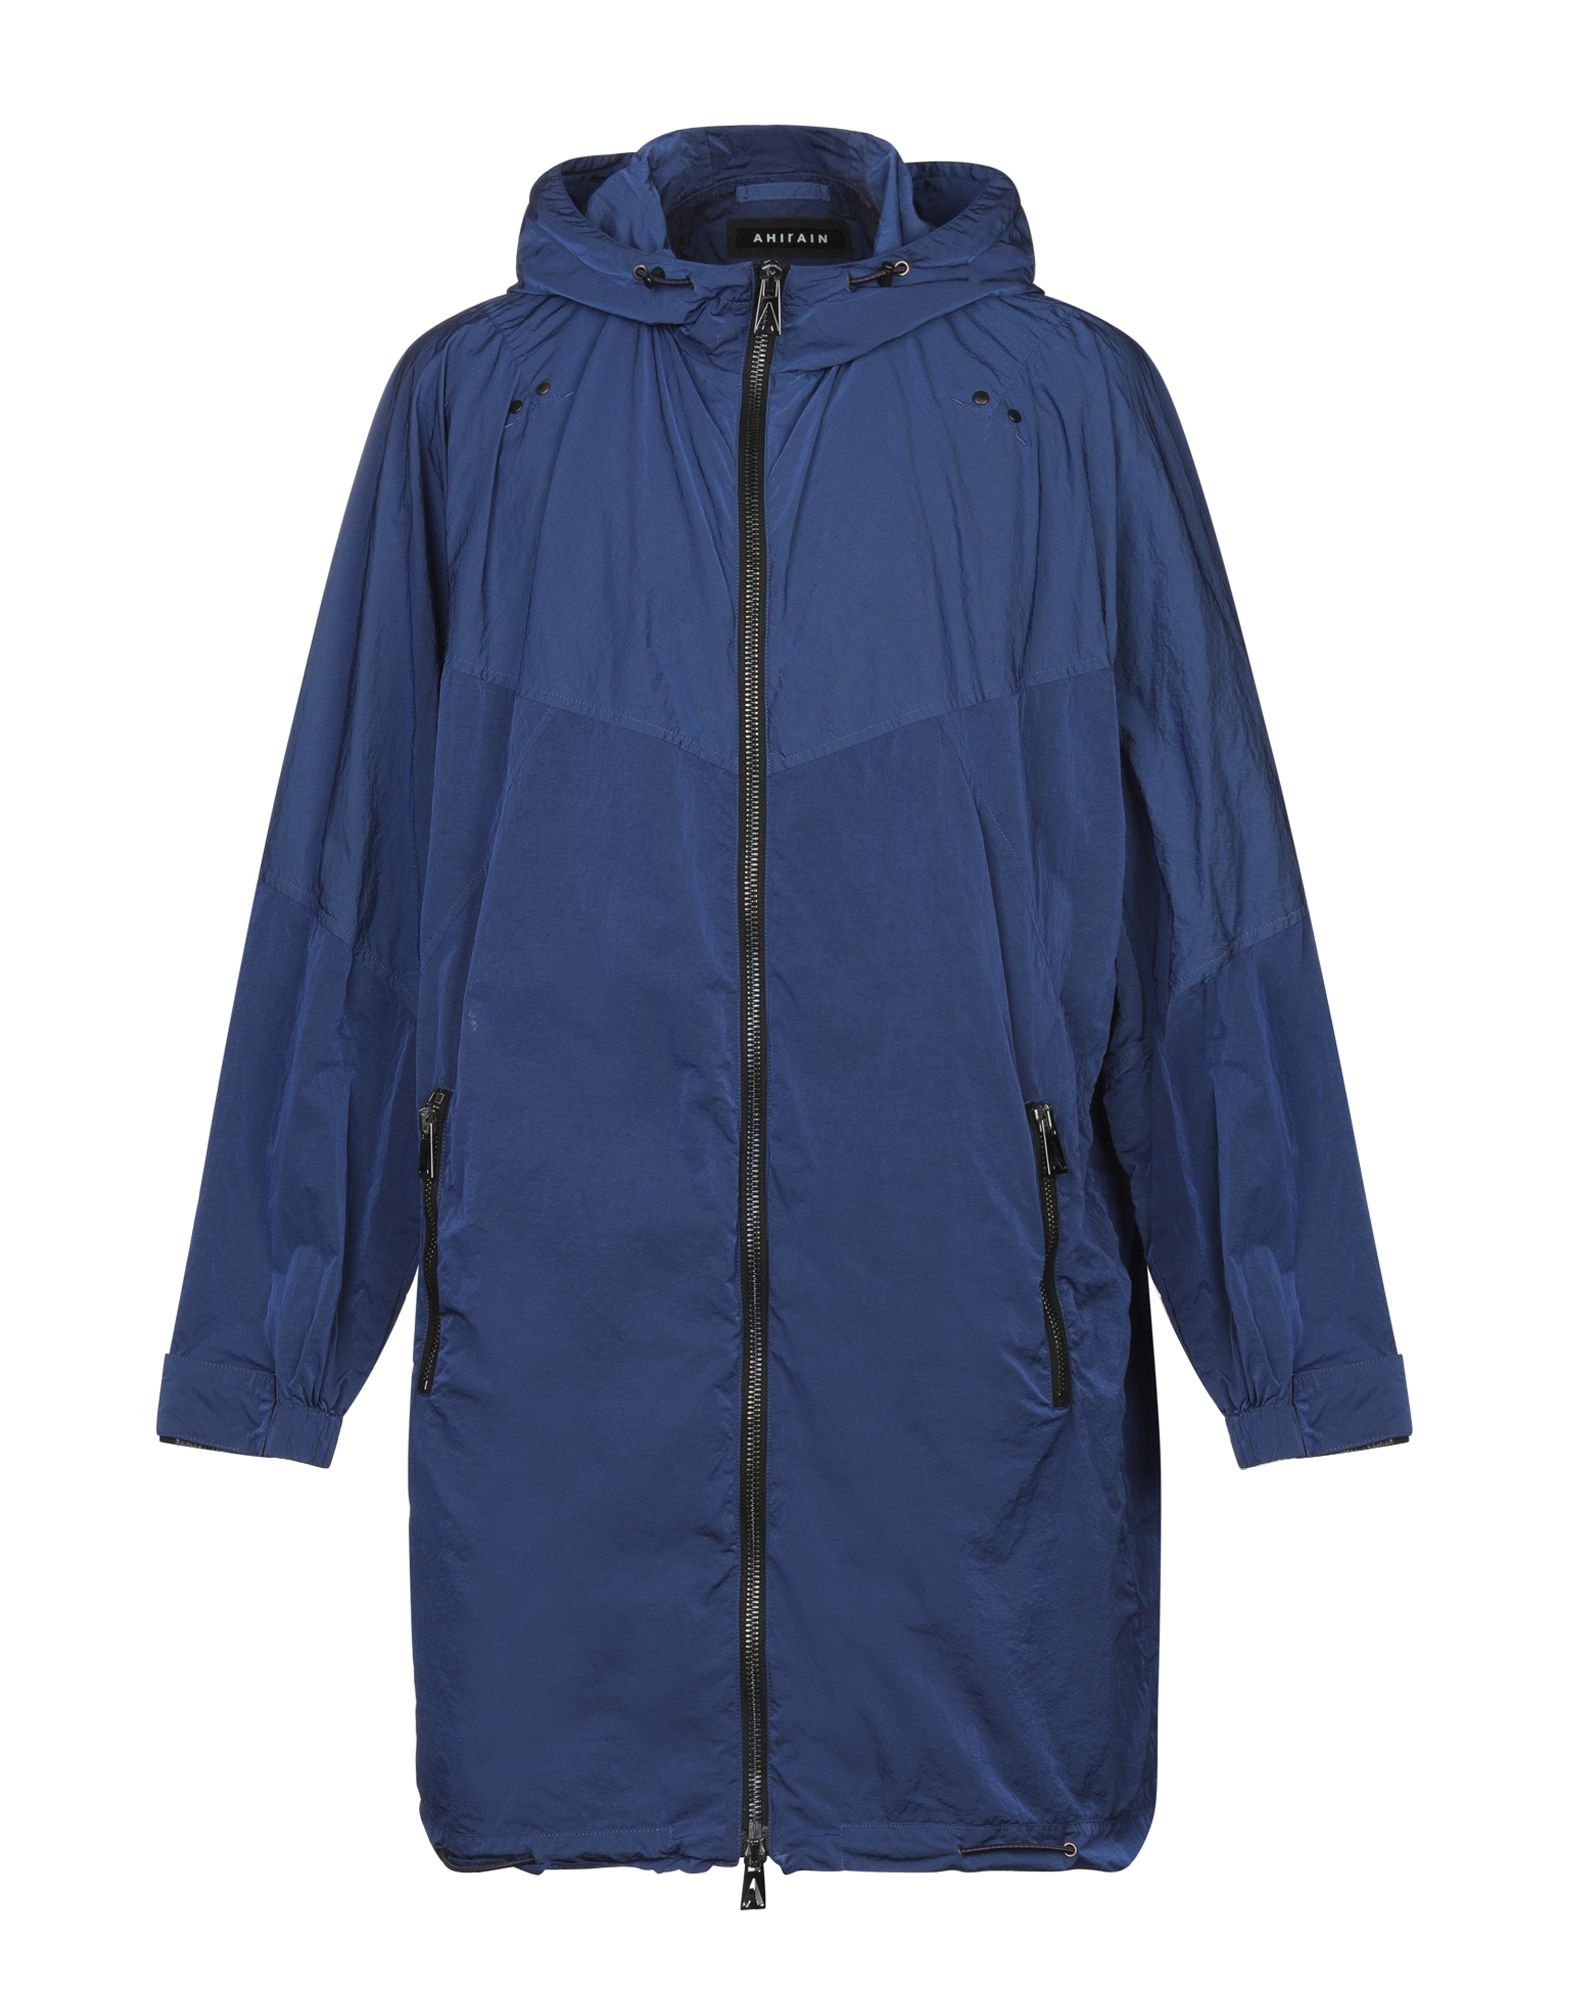 AHIRAIN Легкое пальто ahirain легкое пальто